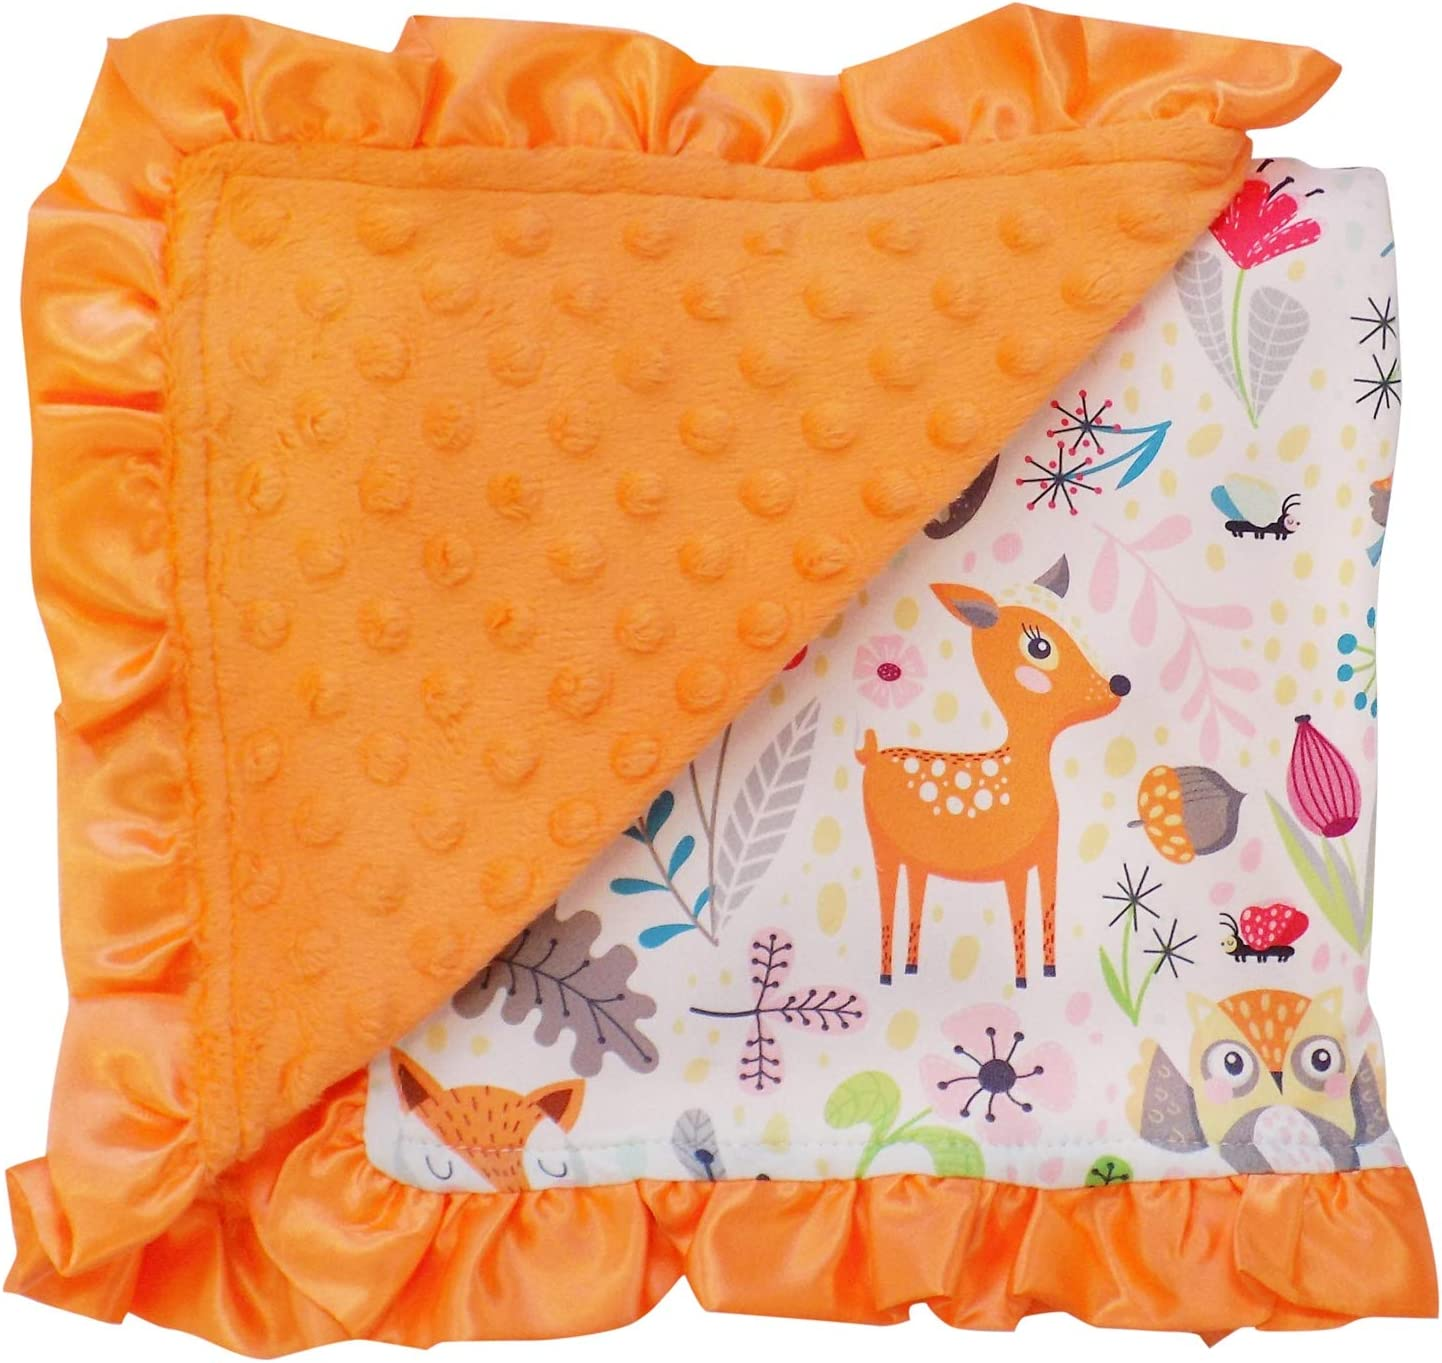 So Sydney Reversible Soft Textured Minky Dot Baby Infant Toddler Blanket with Satin Trim Fabulous Flamingo